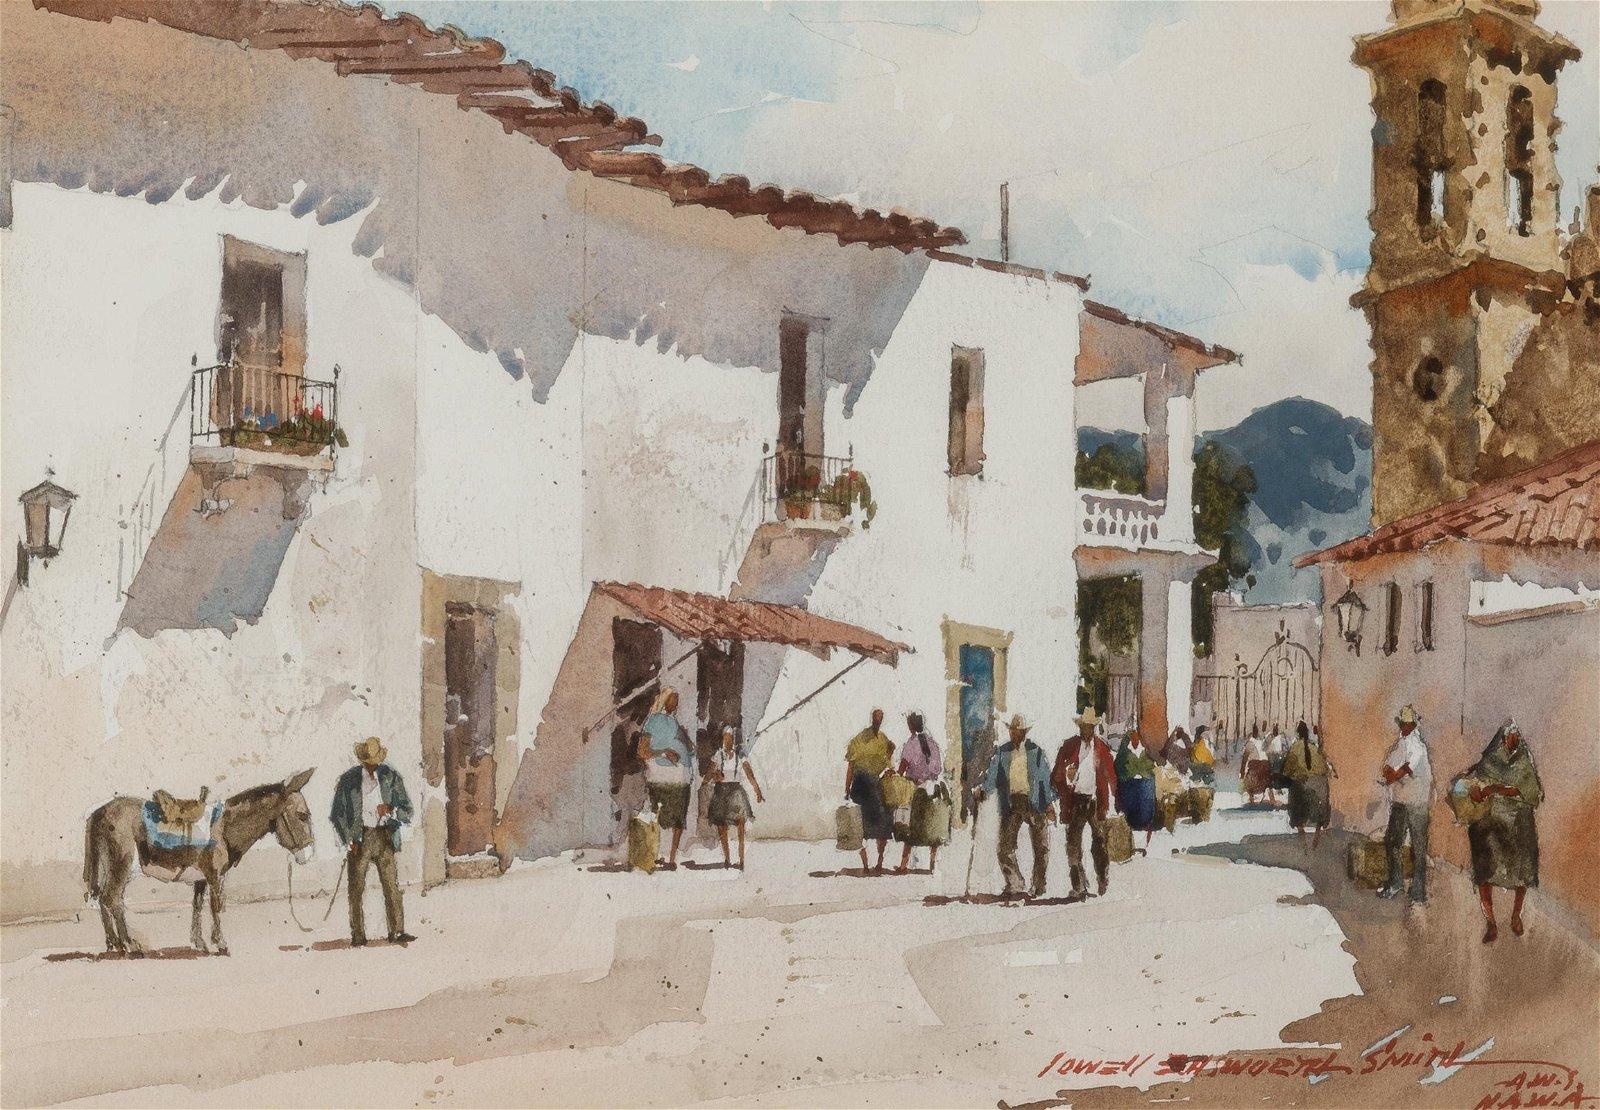 Lowell Ellsworth Smith | Street Scene, Mexico